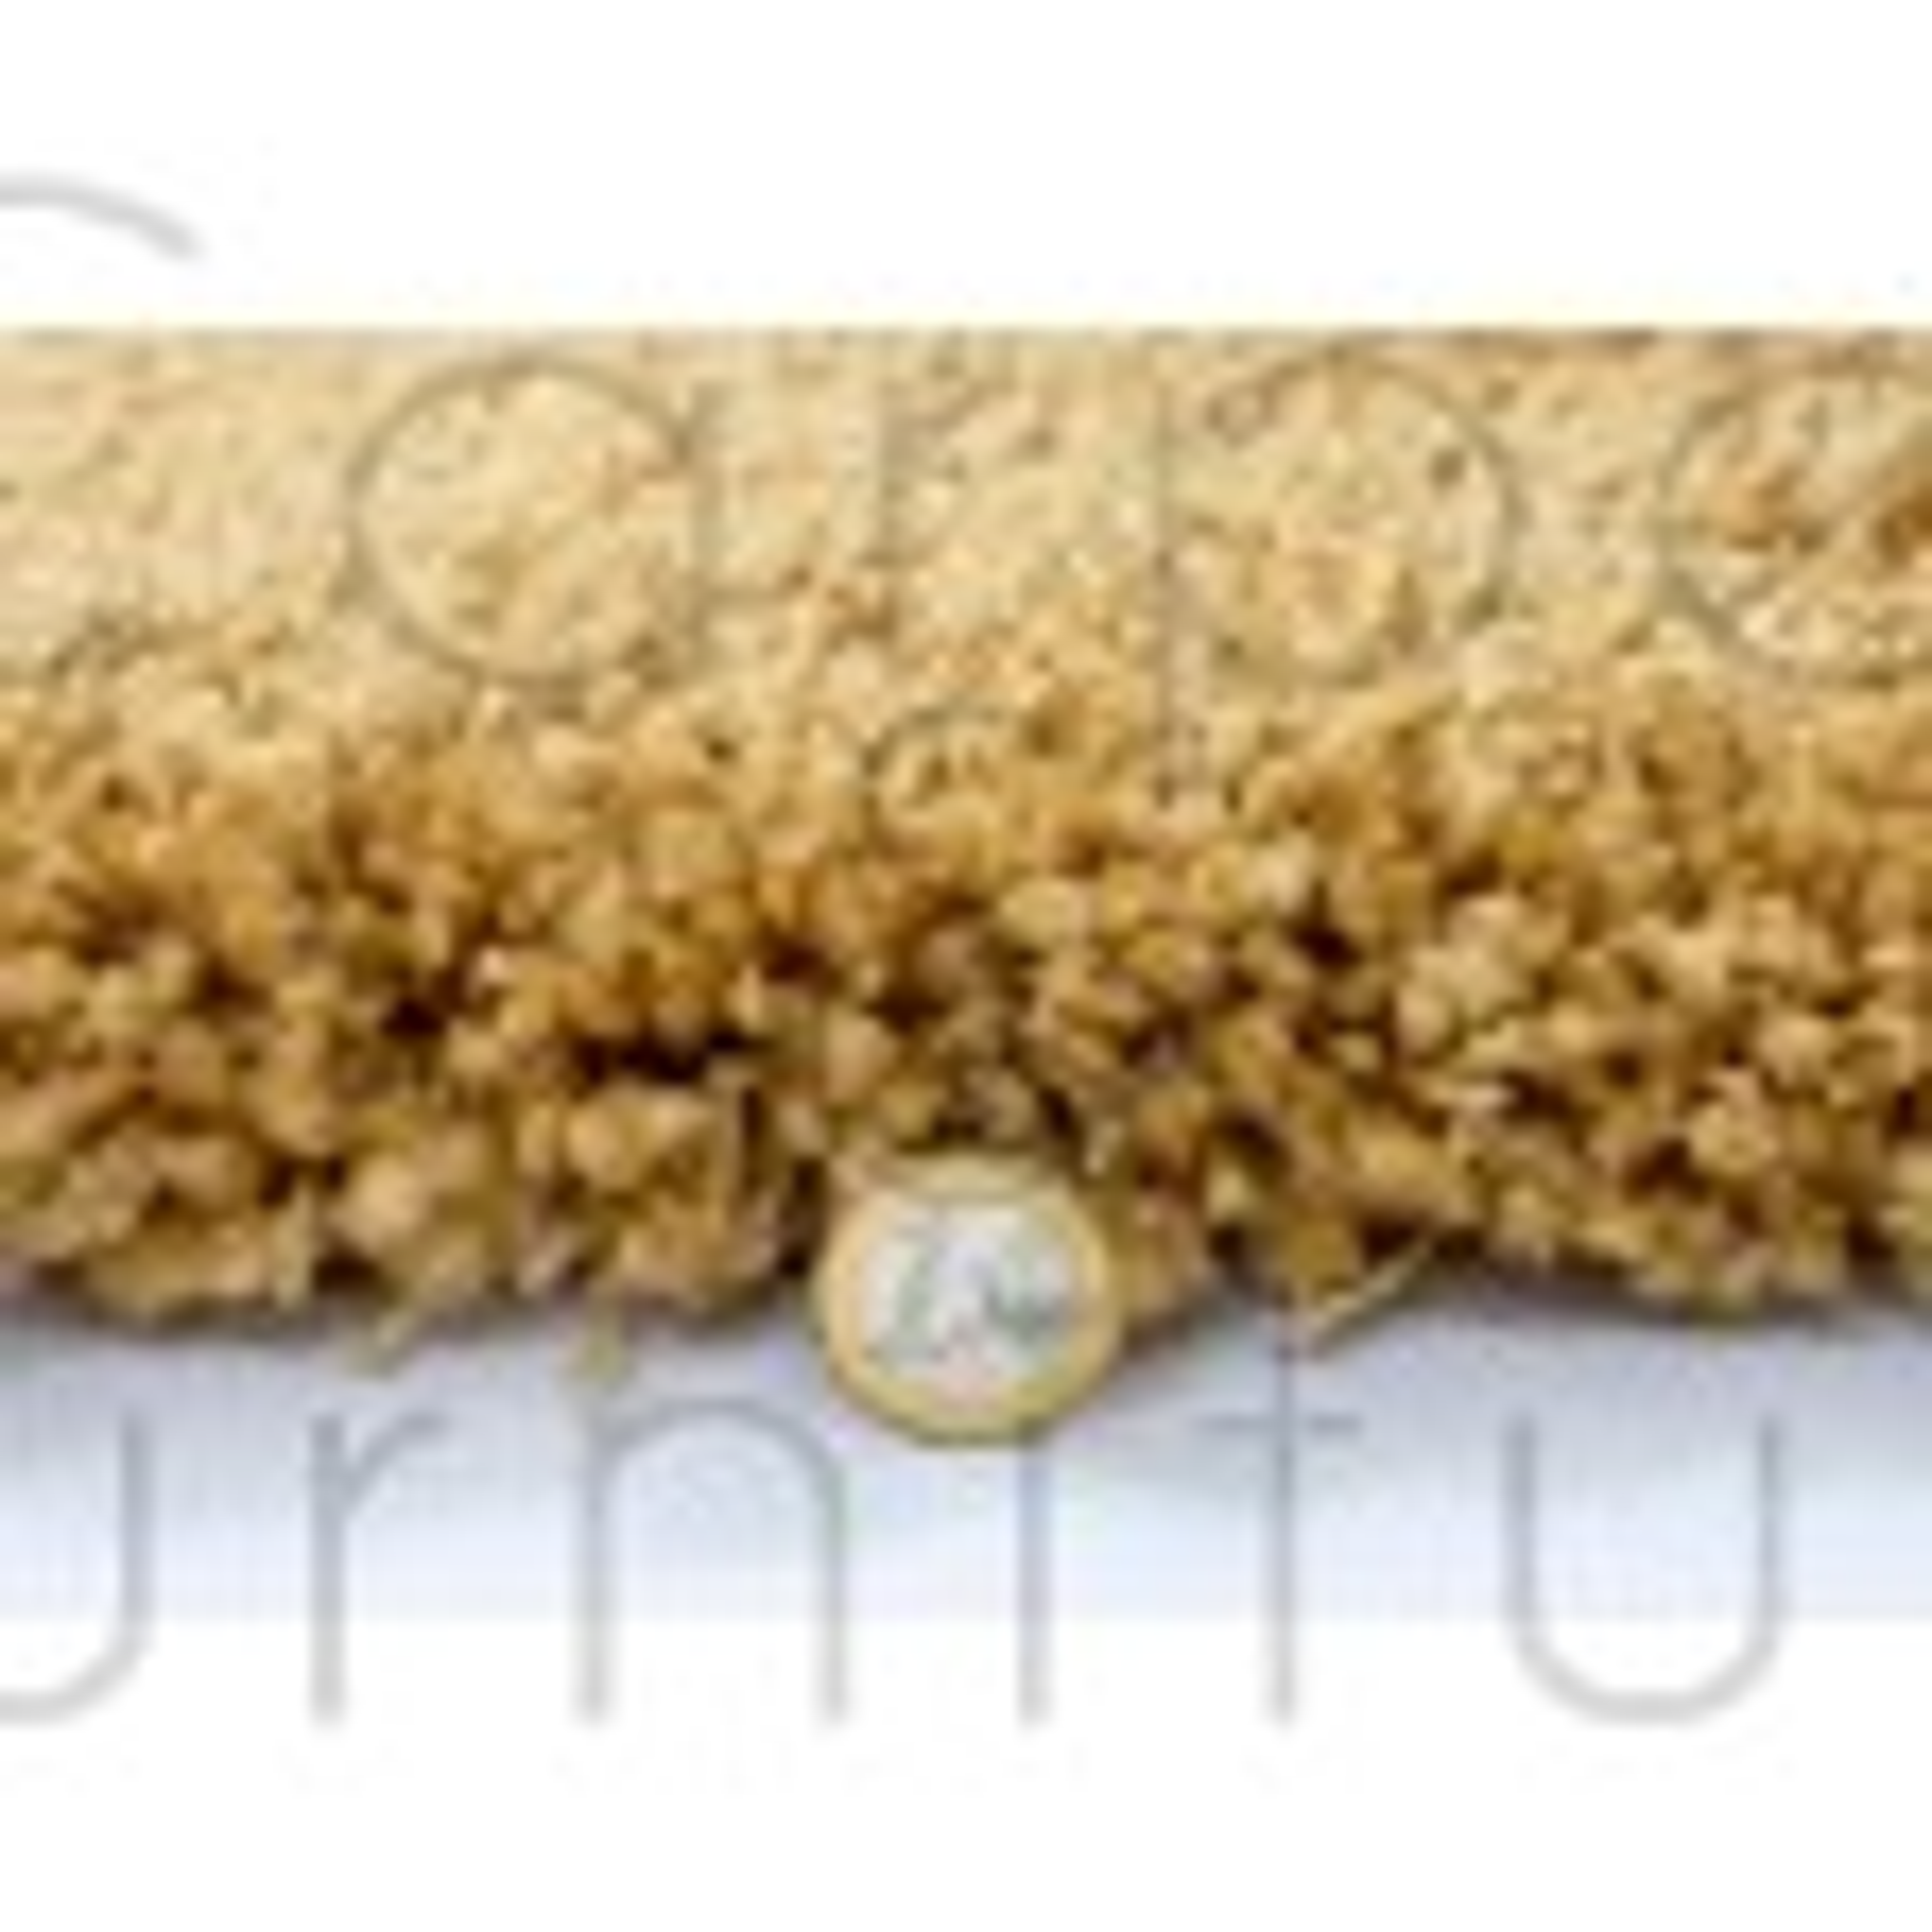 "Athena Shaggy Rug - Ochre Yellow - Size 140 x 200 cm (4'7"" x 6'7"")"